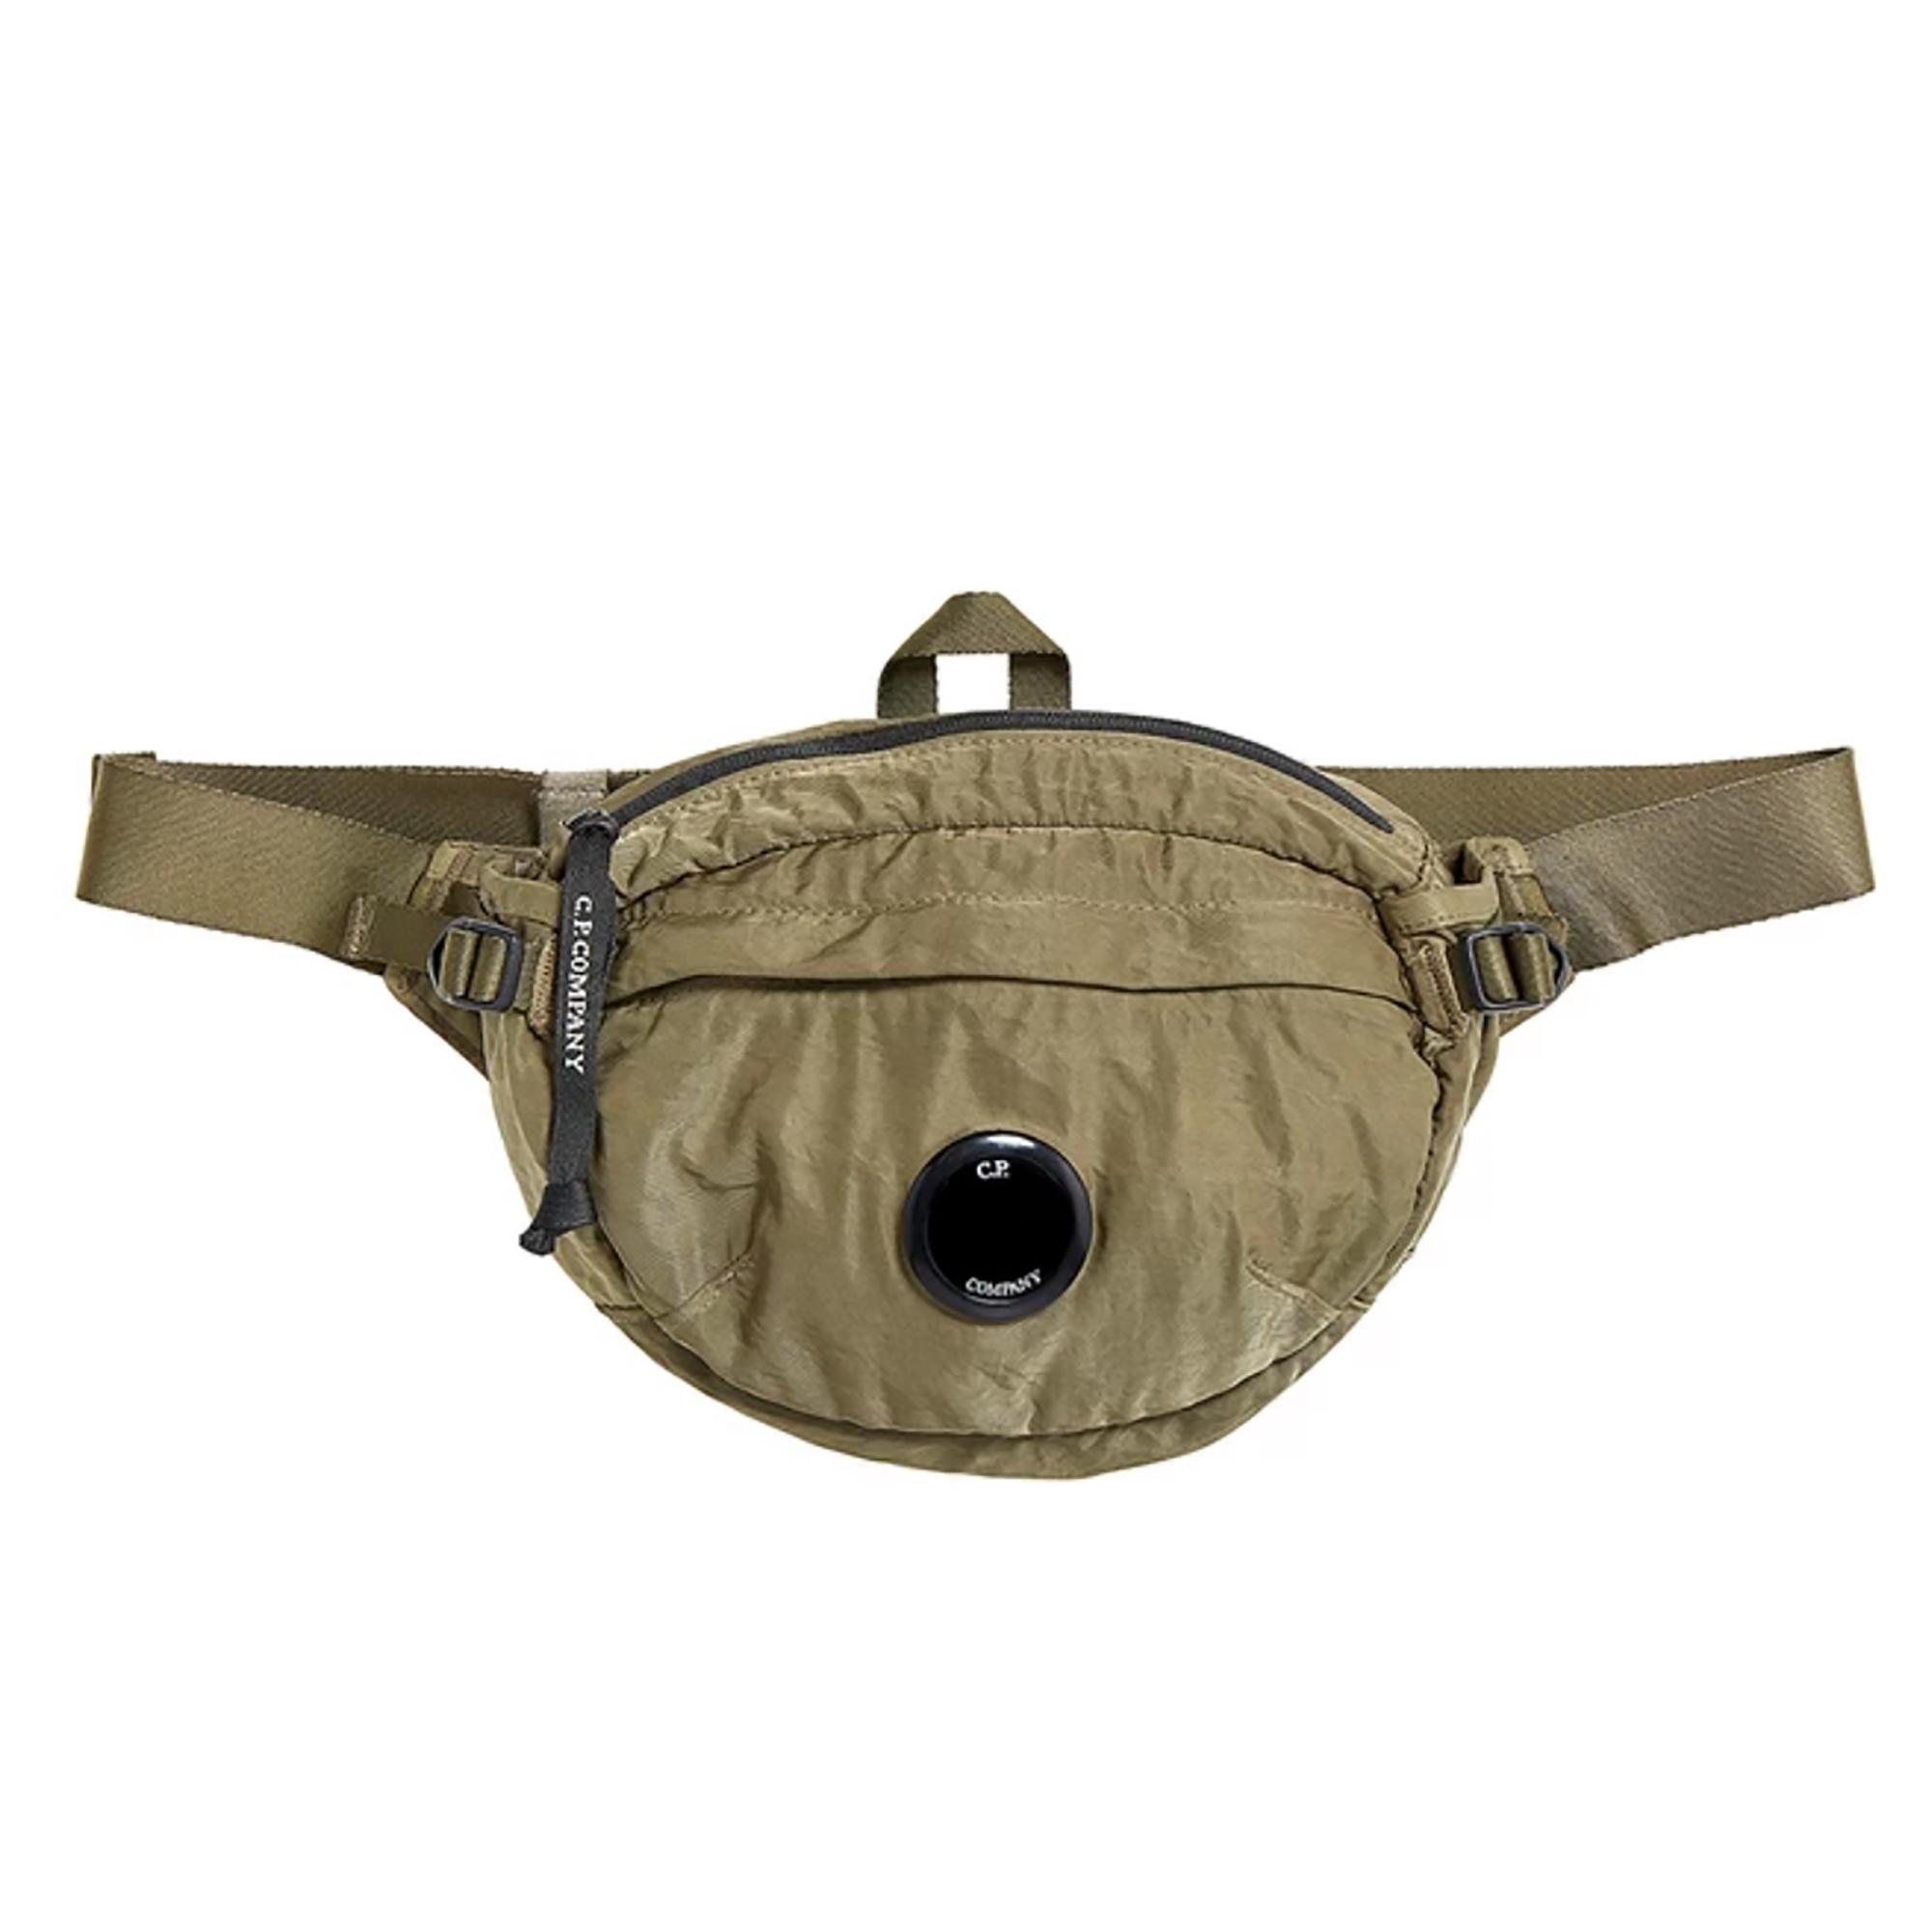 CP Company Garment Dyed Nylon Sateen Lens Waist Bag Olive